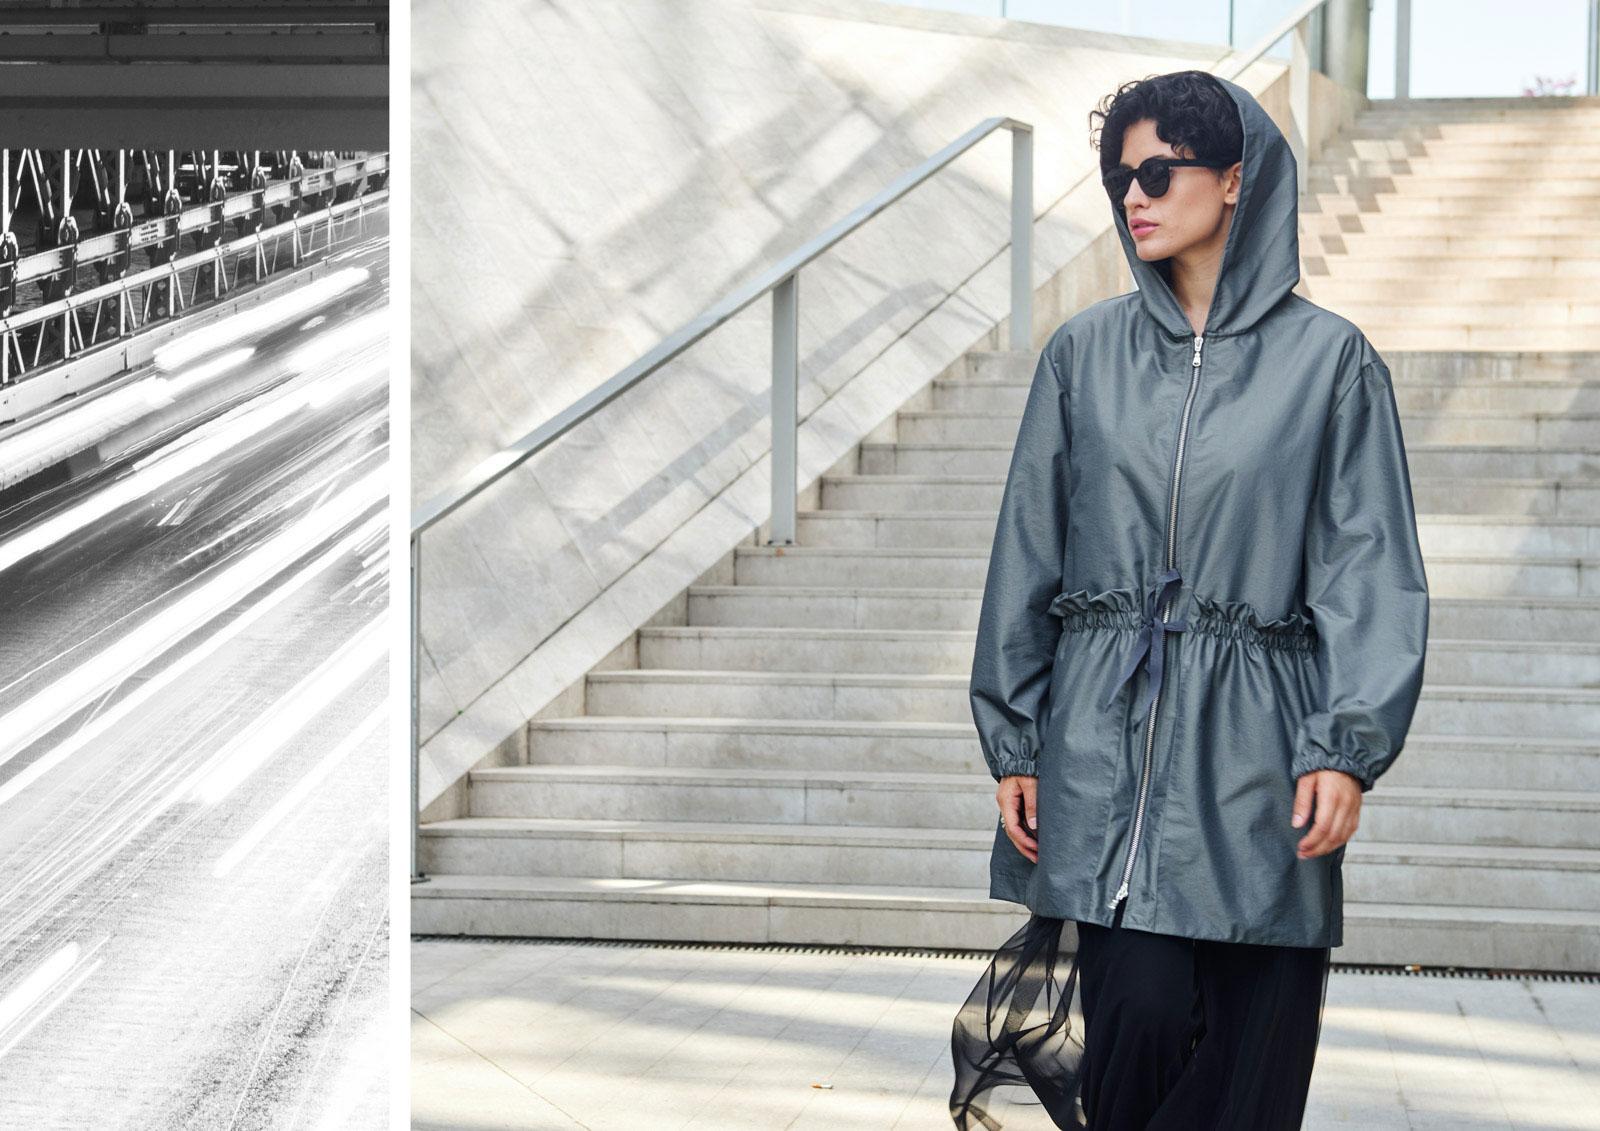 finest selection 75d55 27c8a Curvy | Abbigliamento pronto moda donna linee morbide, fast ...